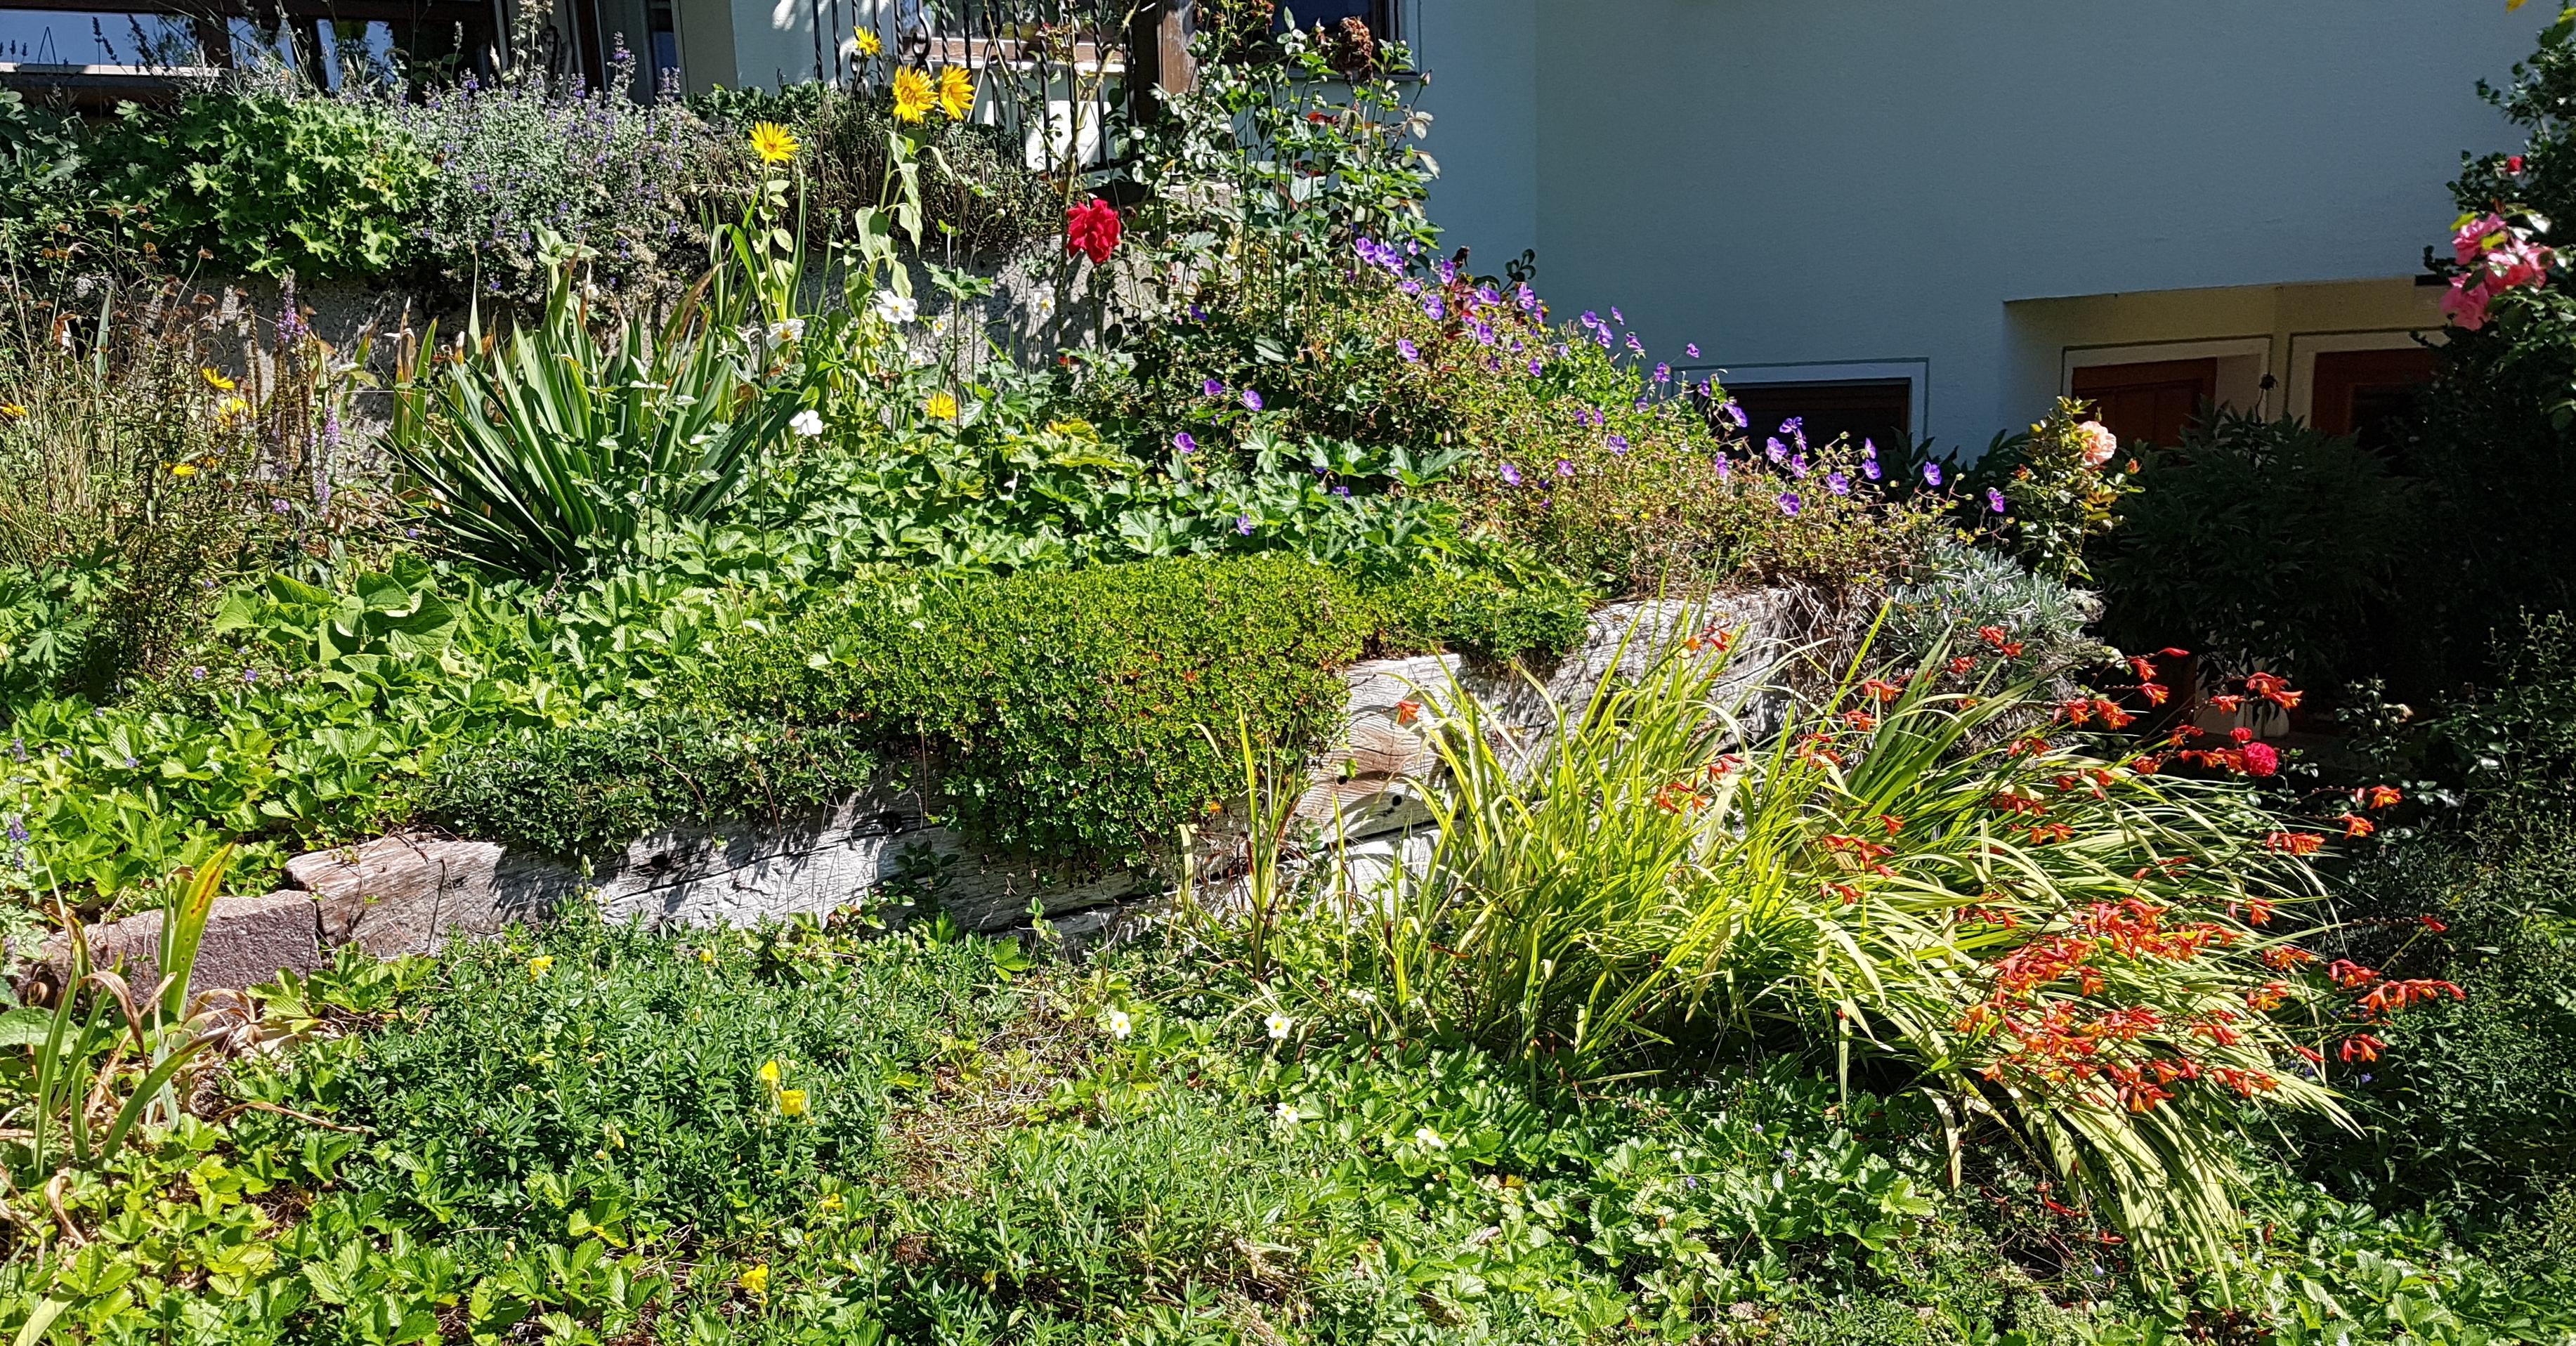 Im September blüht der Trockenhang üppiger, als im August